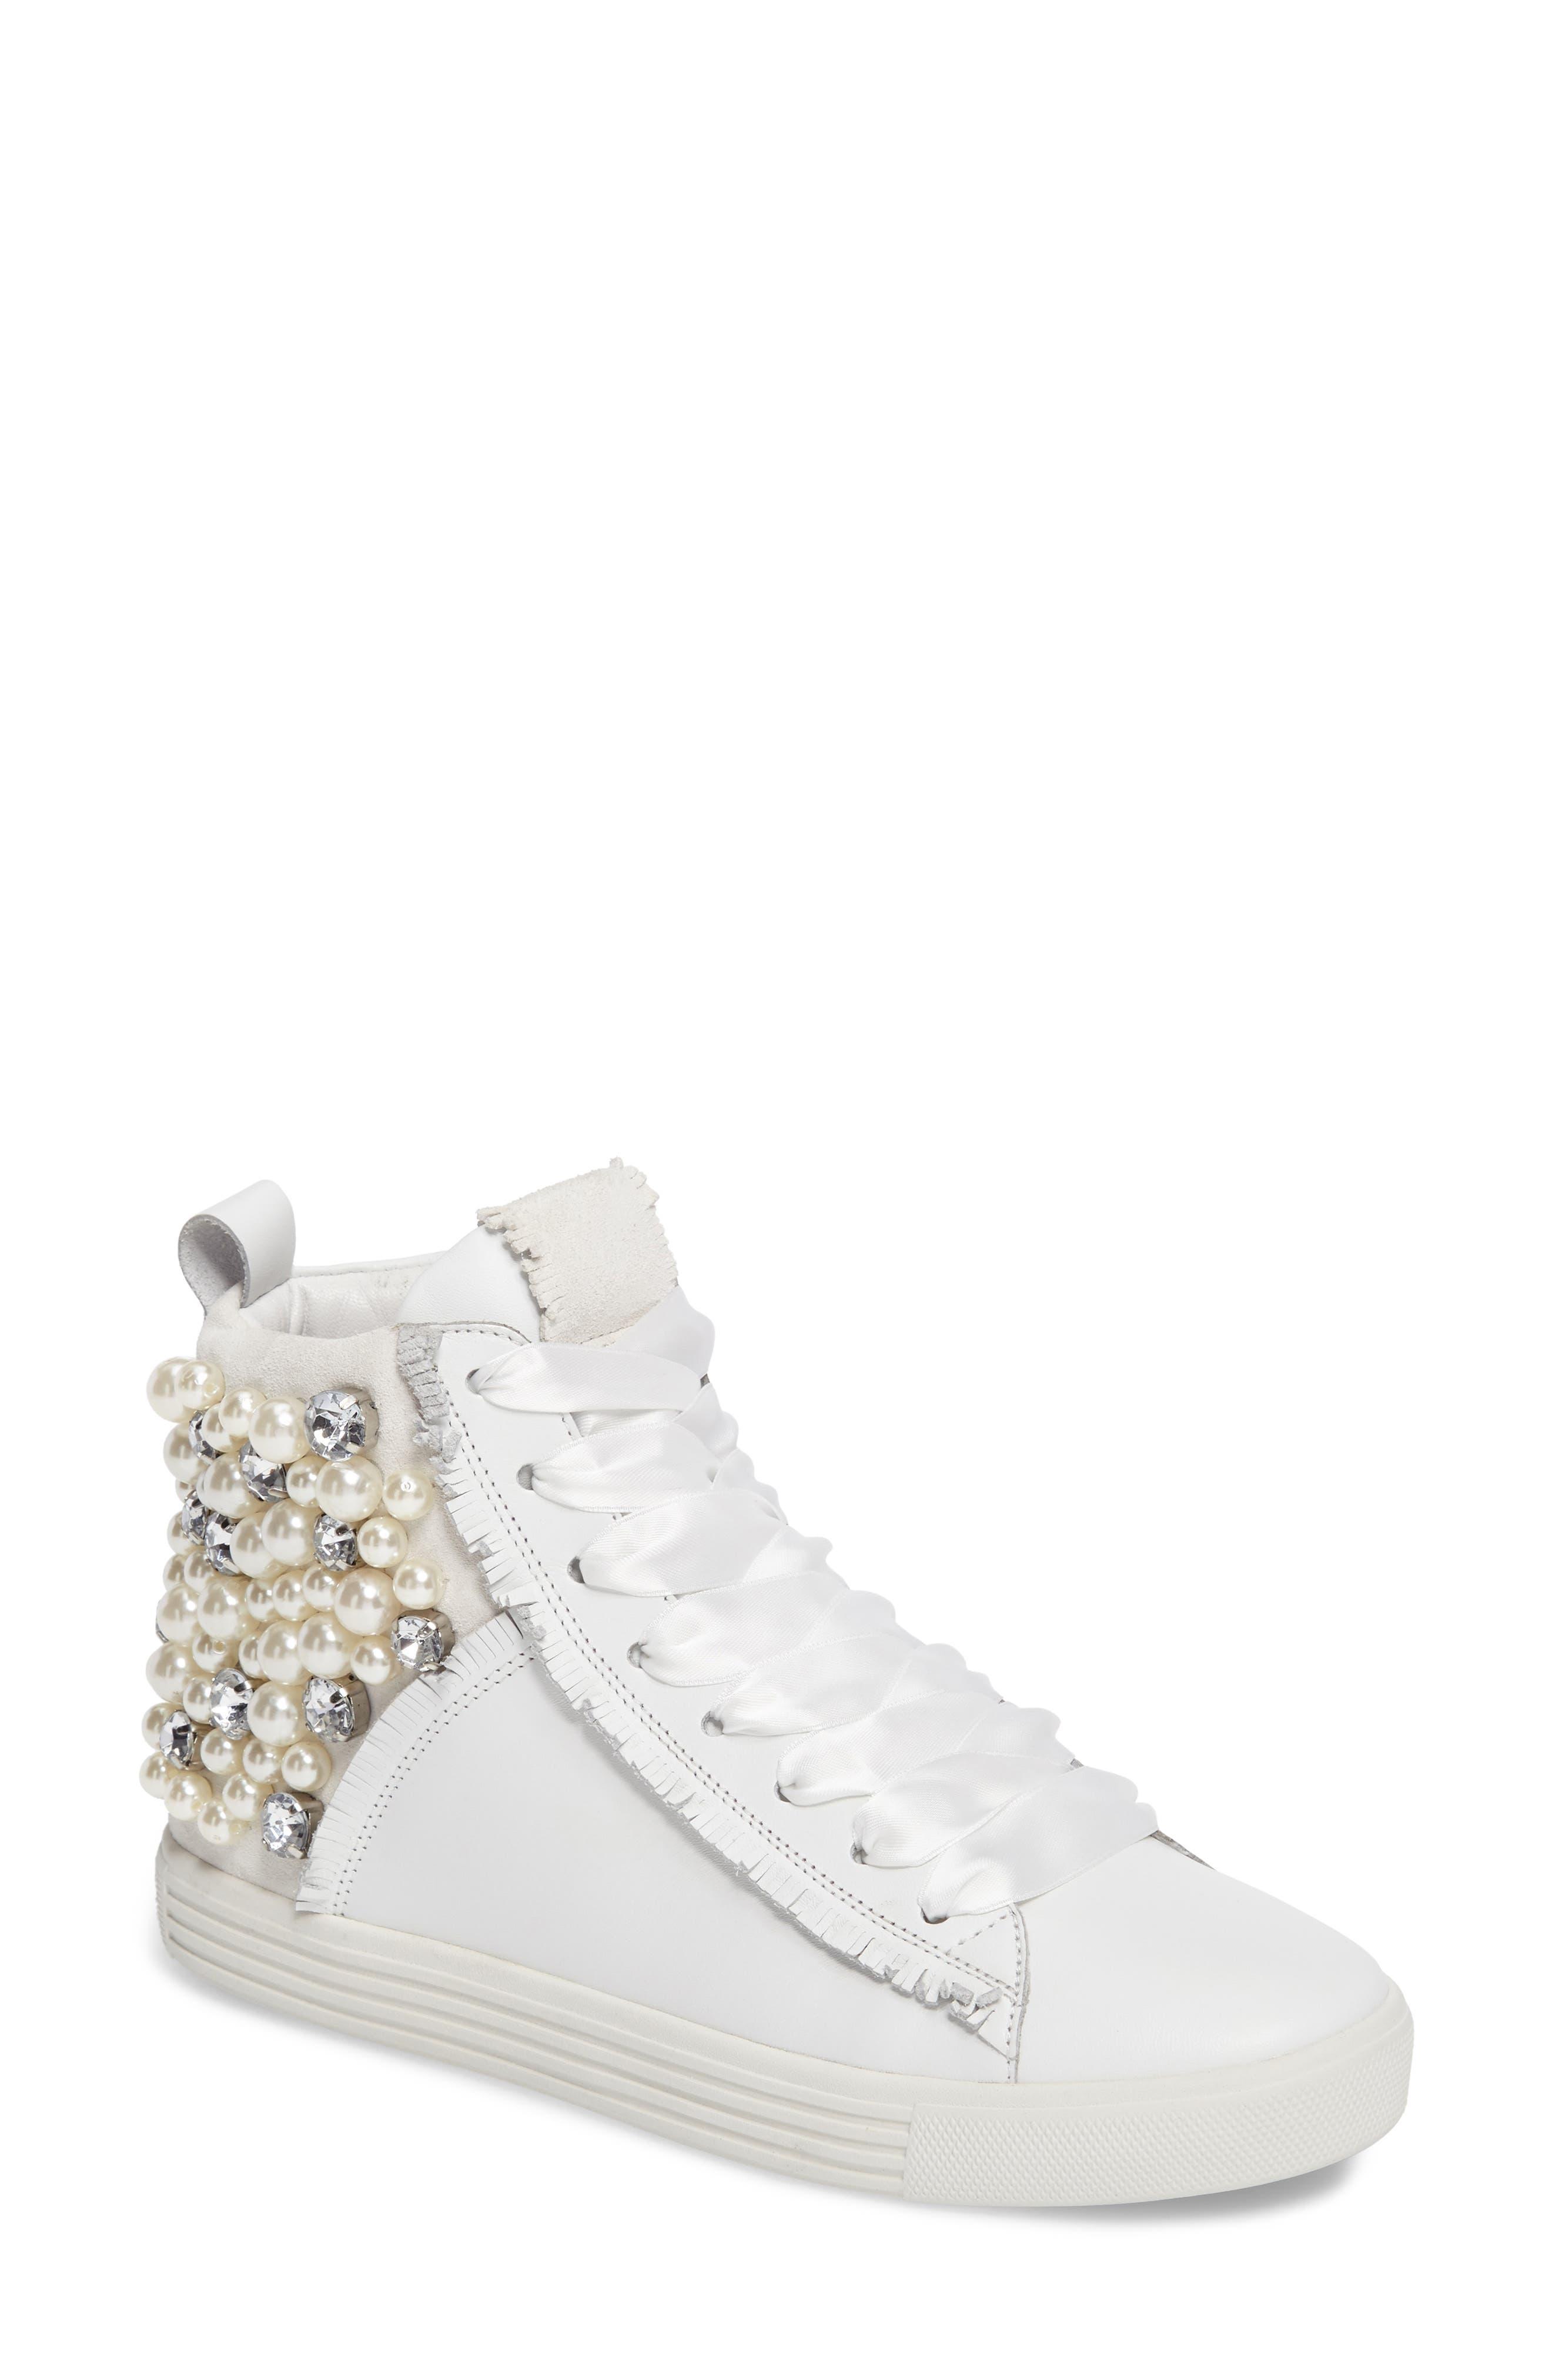 Kennel & Schmenger Town Flower High Top Sneaker,                         Main,                         color, White